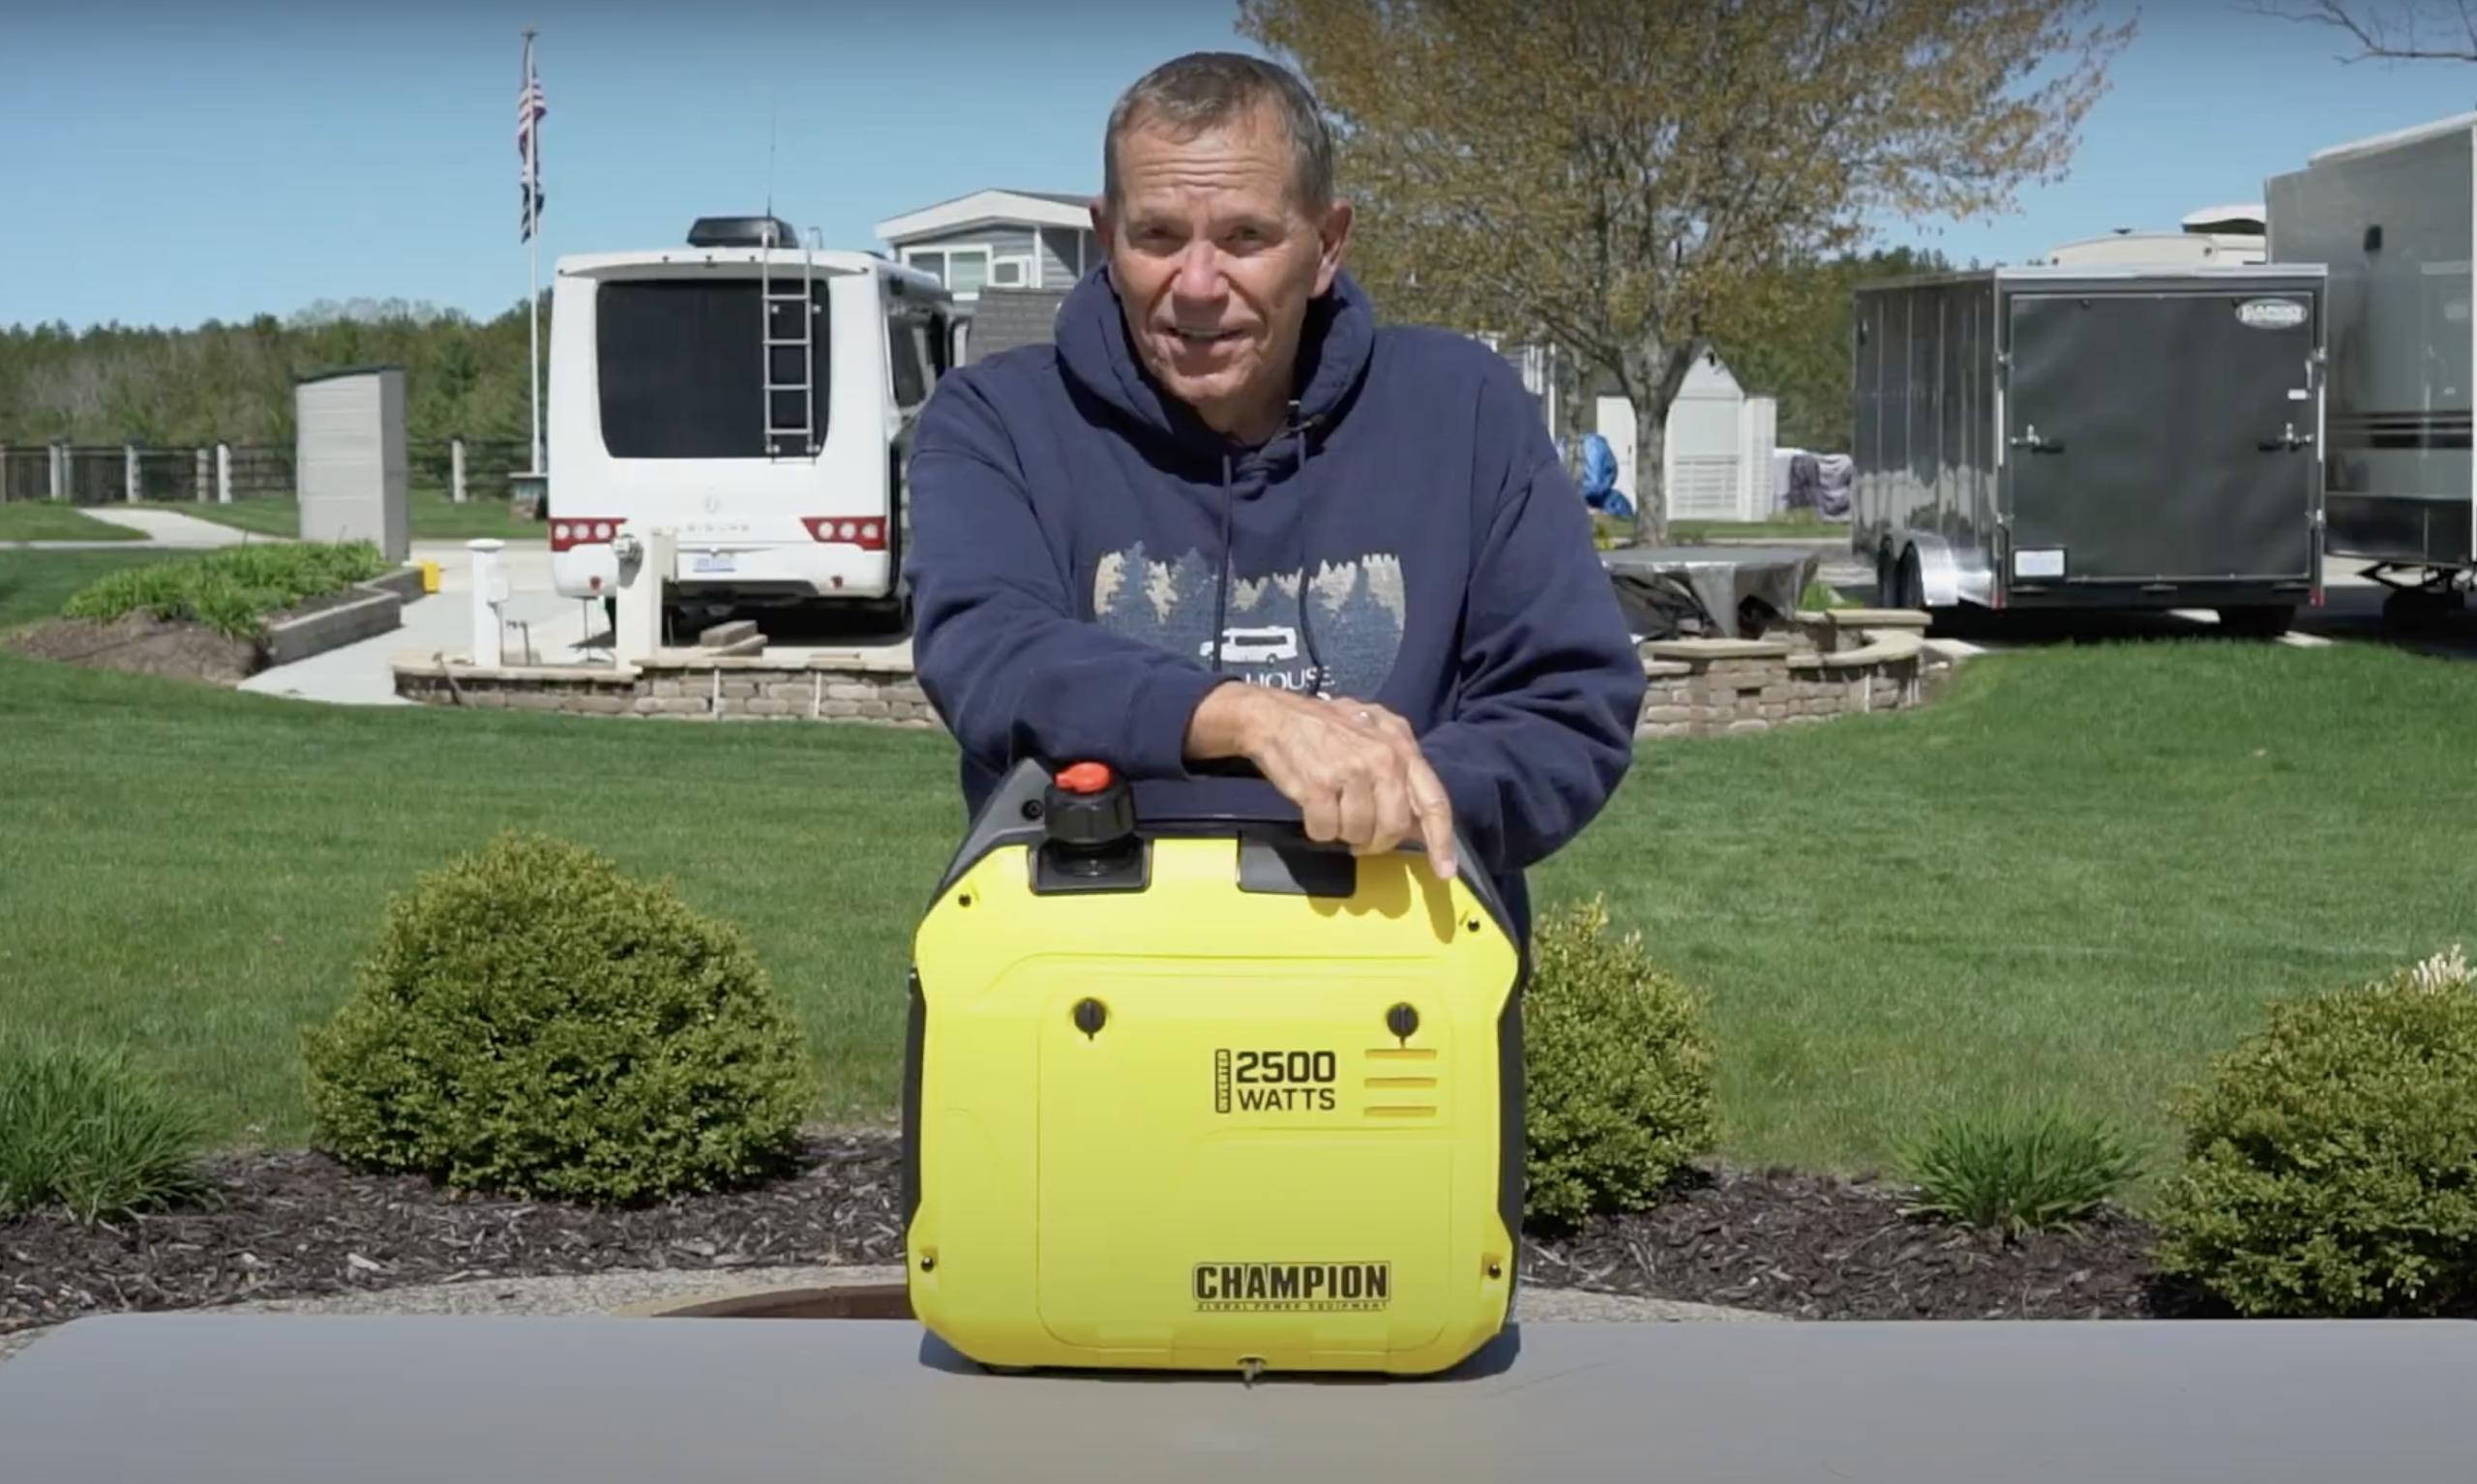 Champion 2500 Watt Portable Inverter Generator Review